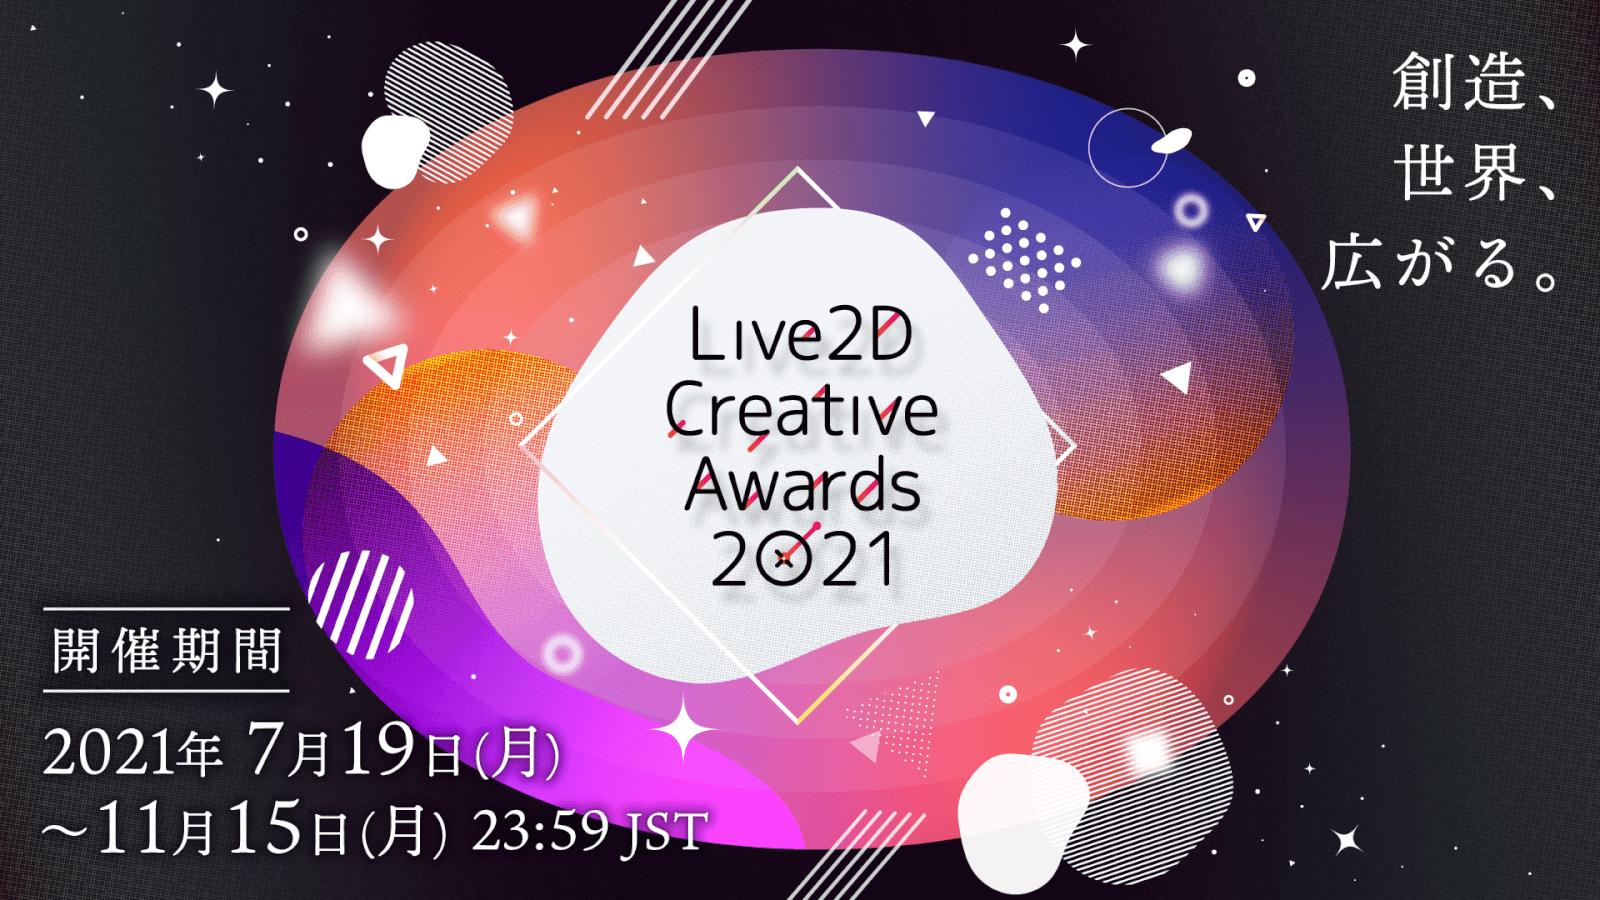 Live2D Creative Awards 2021